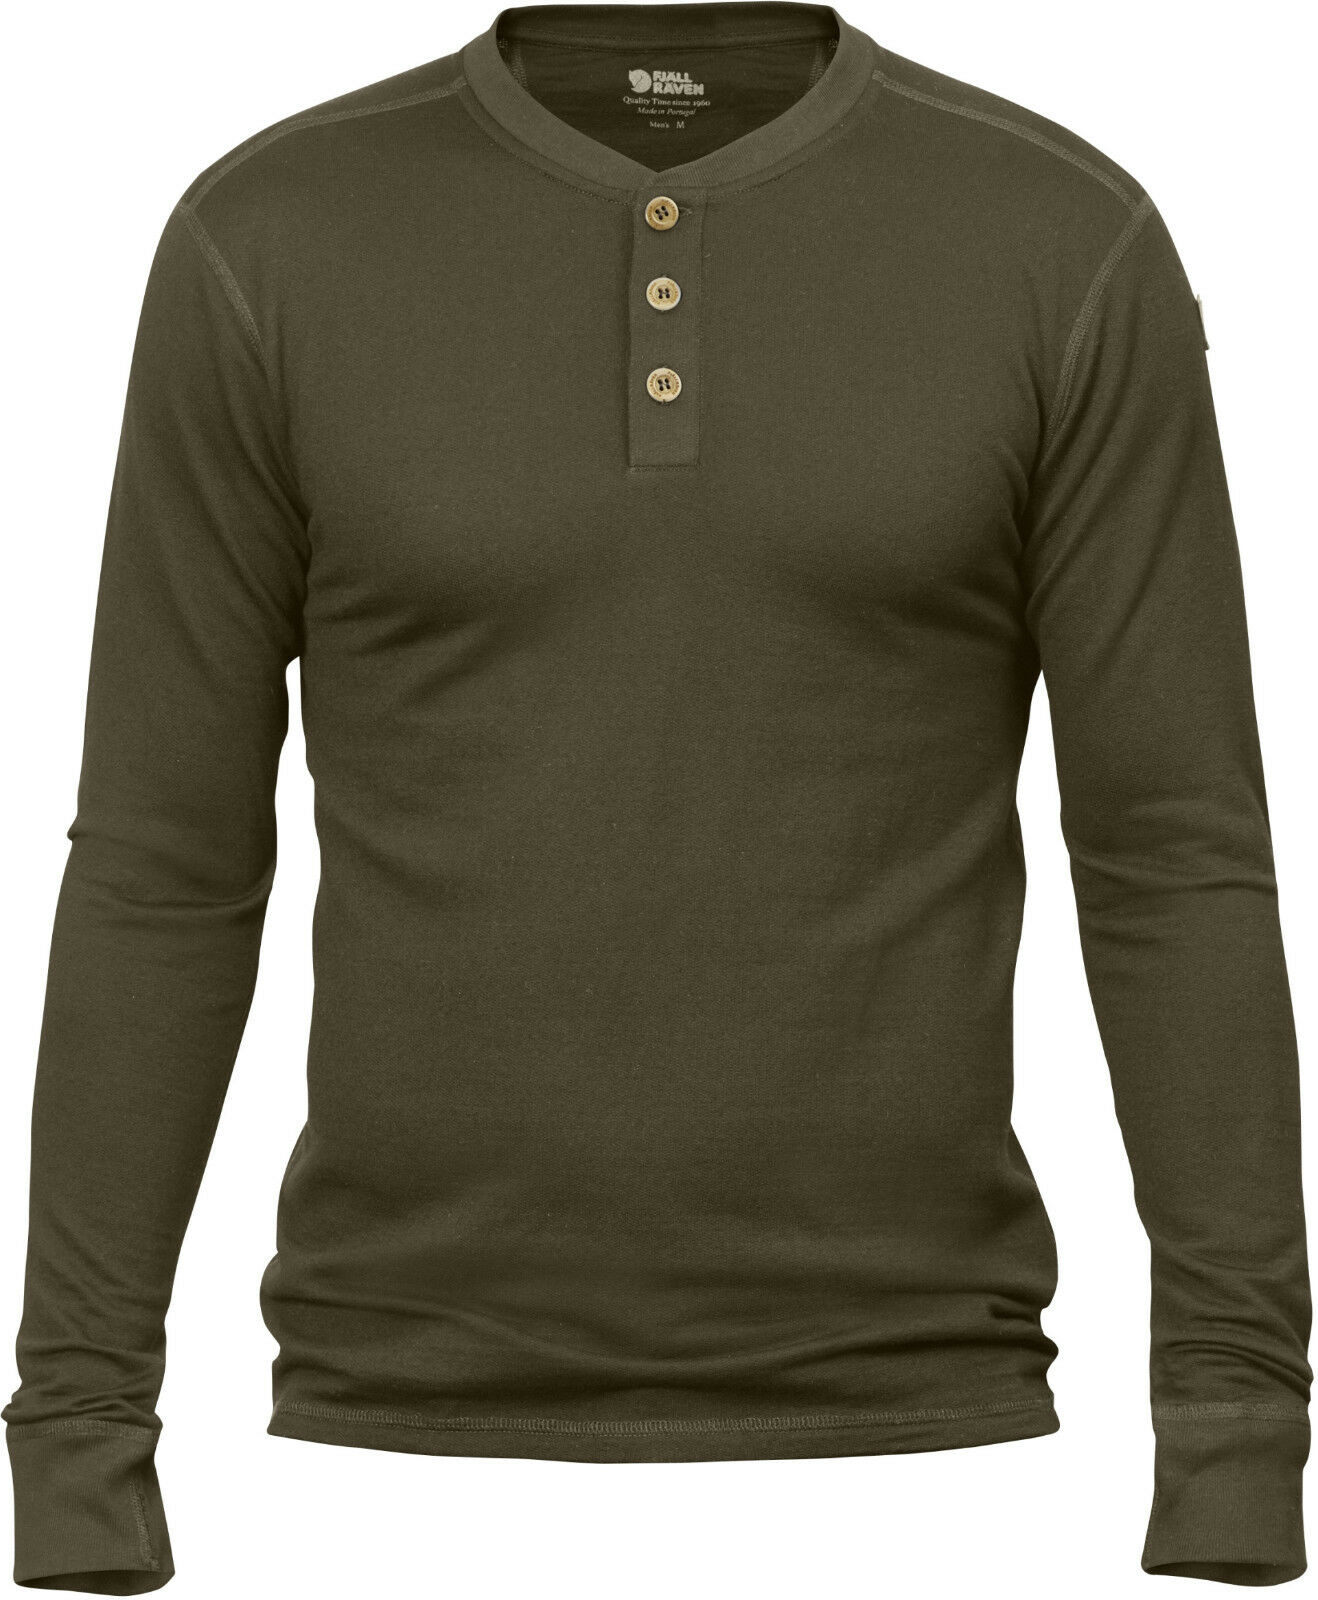 Fjällräven Lappland Merino Henley LS Shirt 90188 dark oliv Unterhemd Base Layer